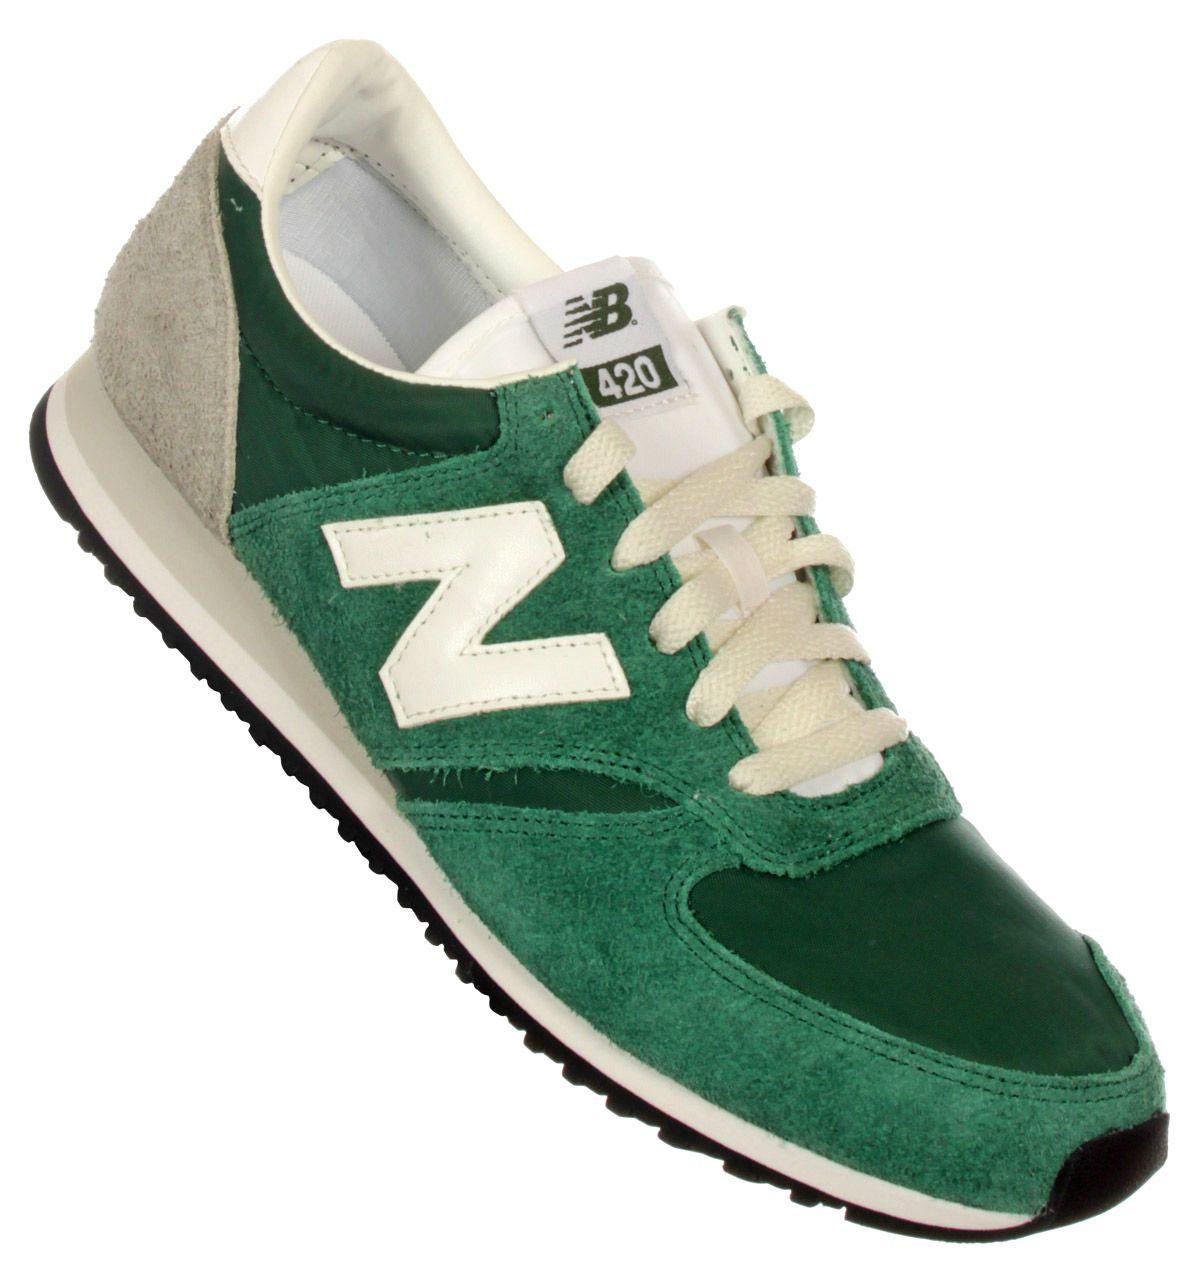 New Balance Footwear. New Balance 620 Green Nylon Trainers